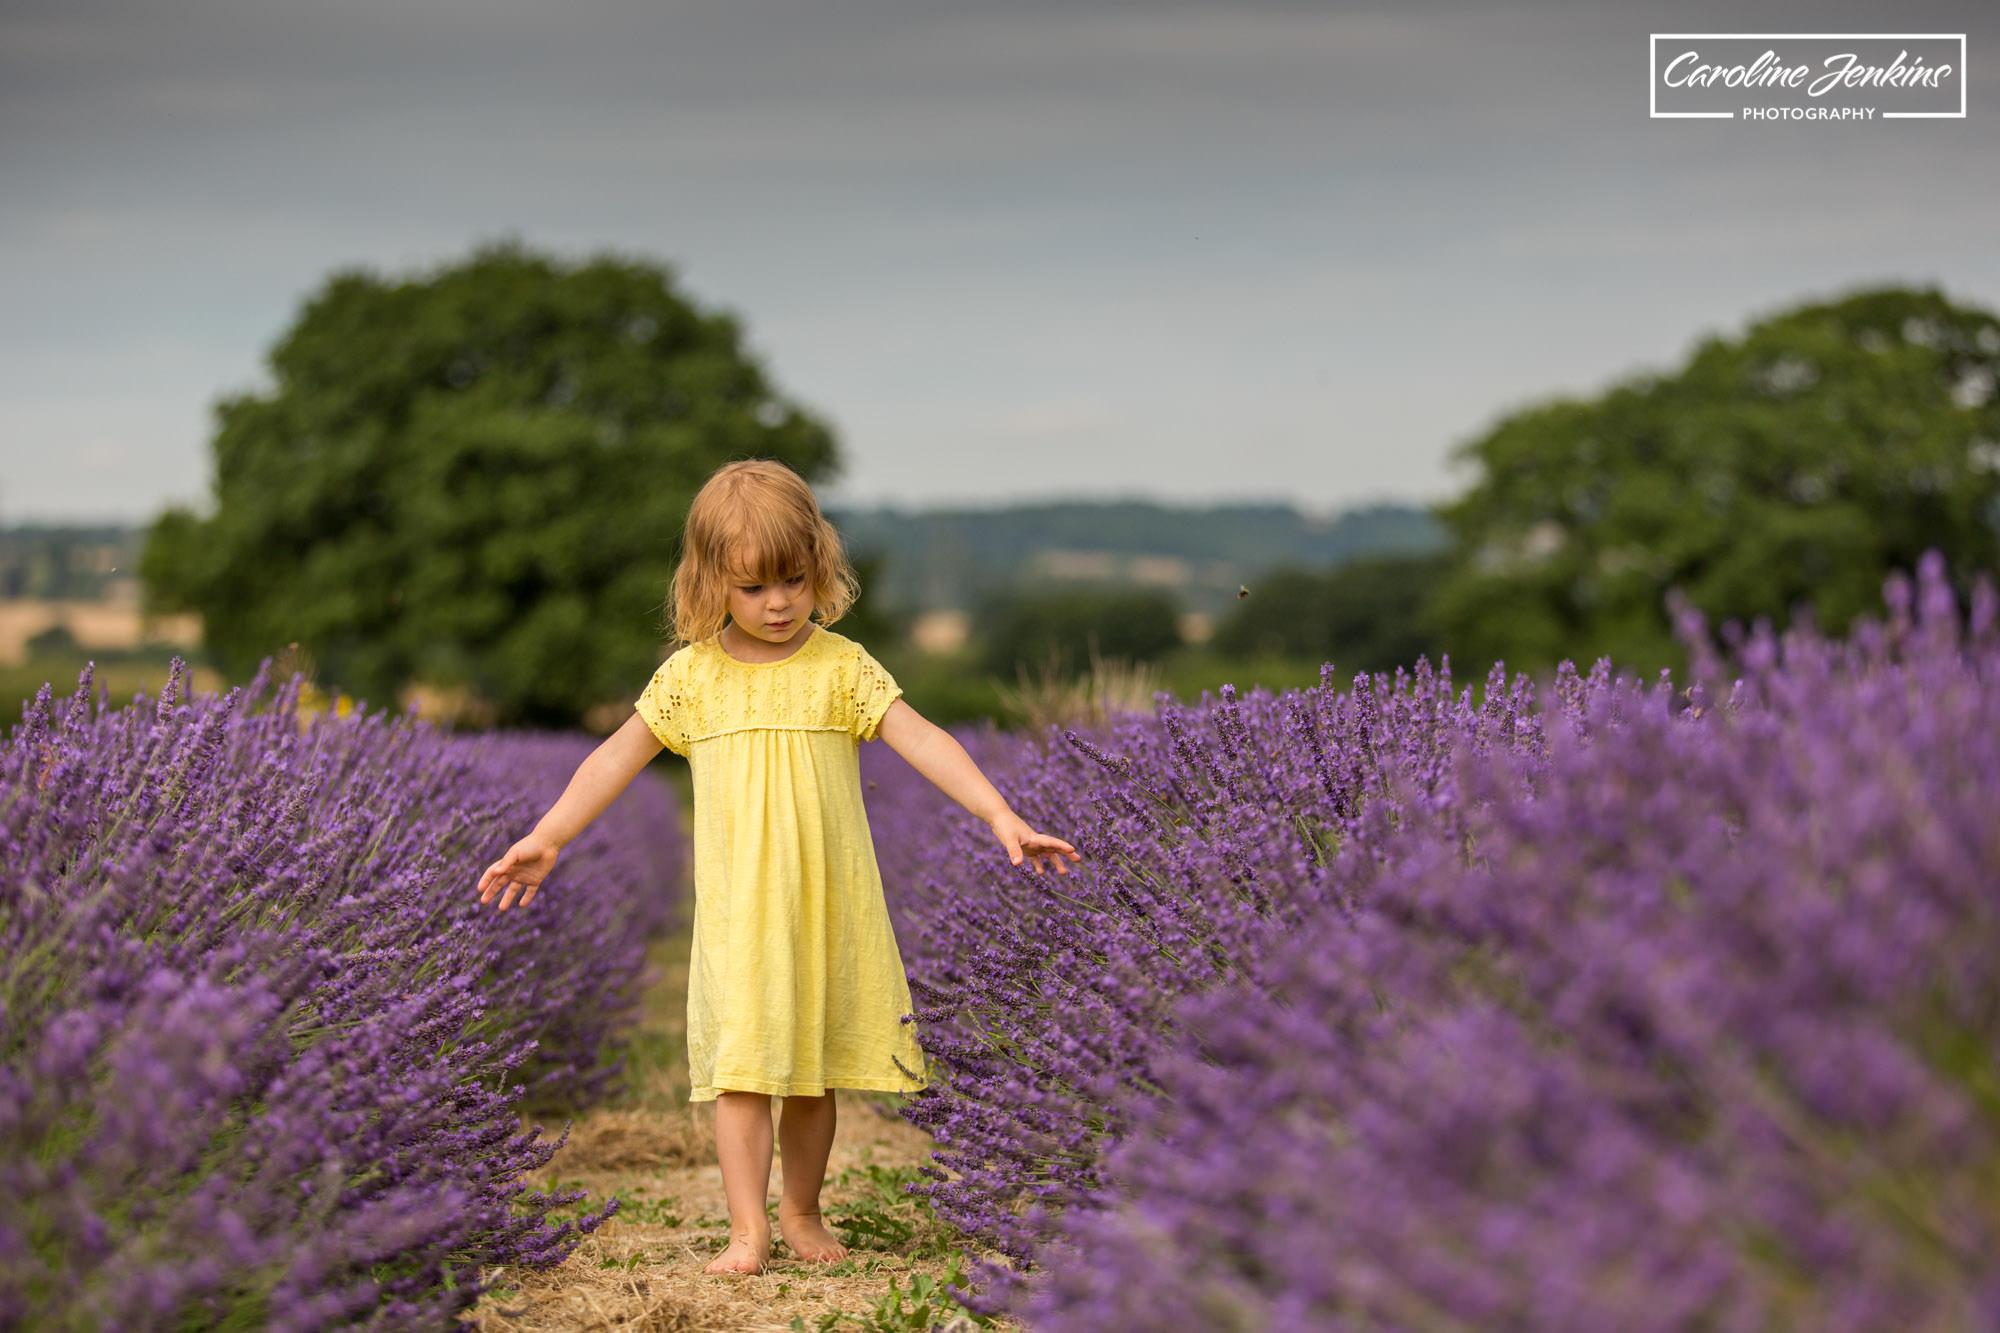 Mini shoot photo shoots in Hampshire